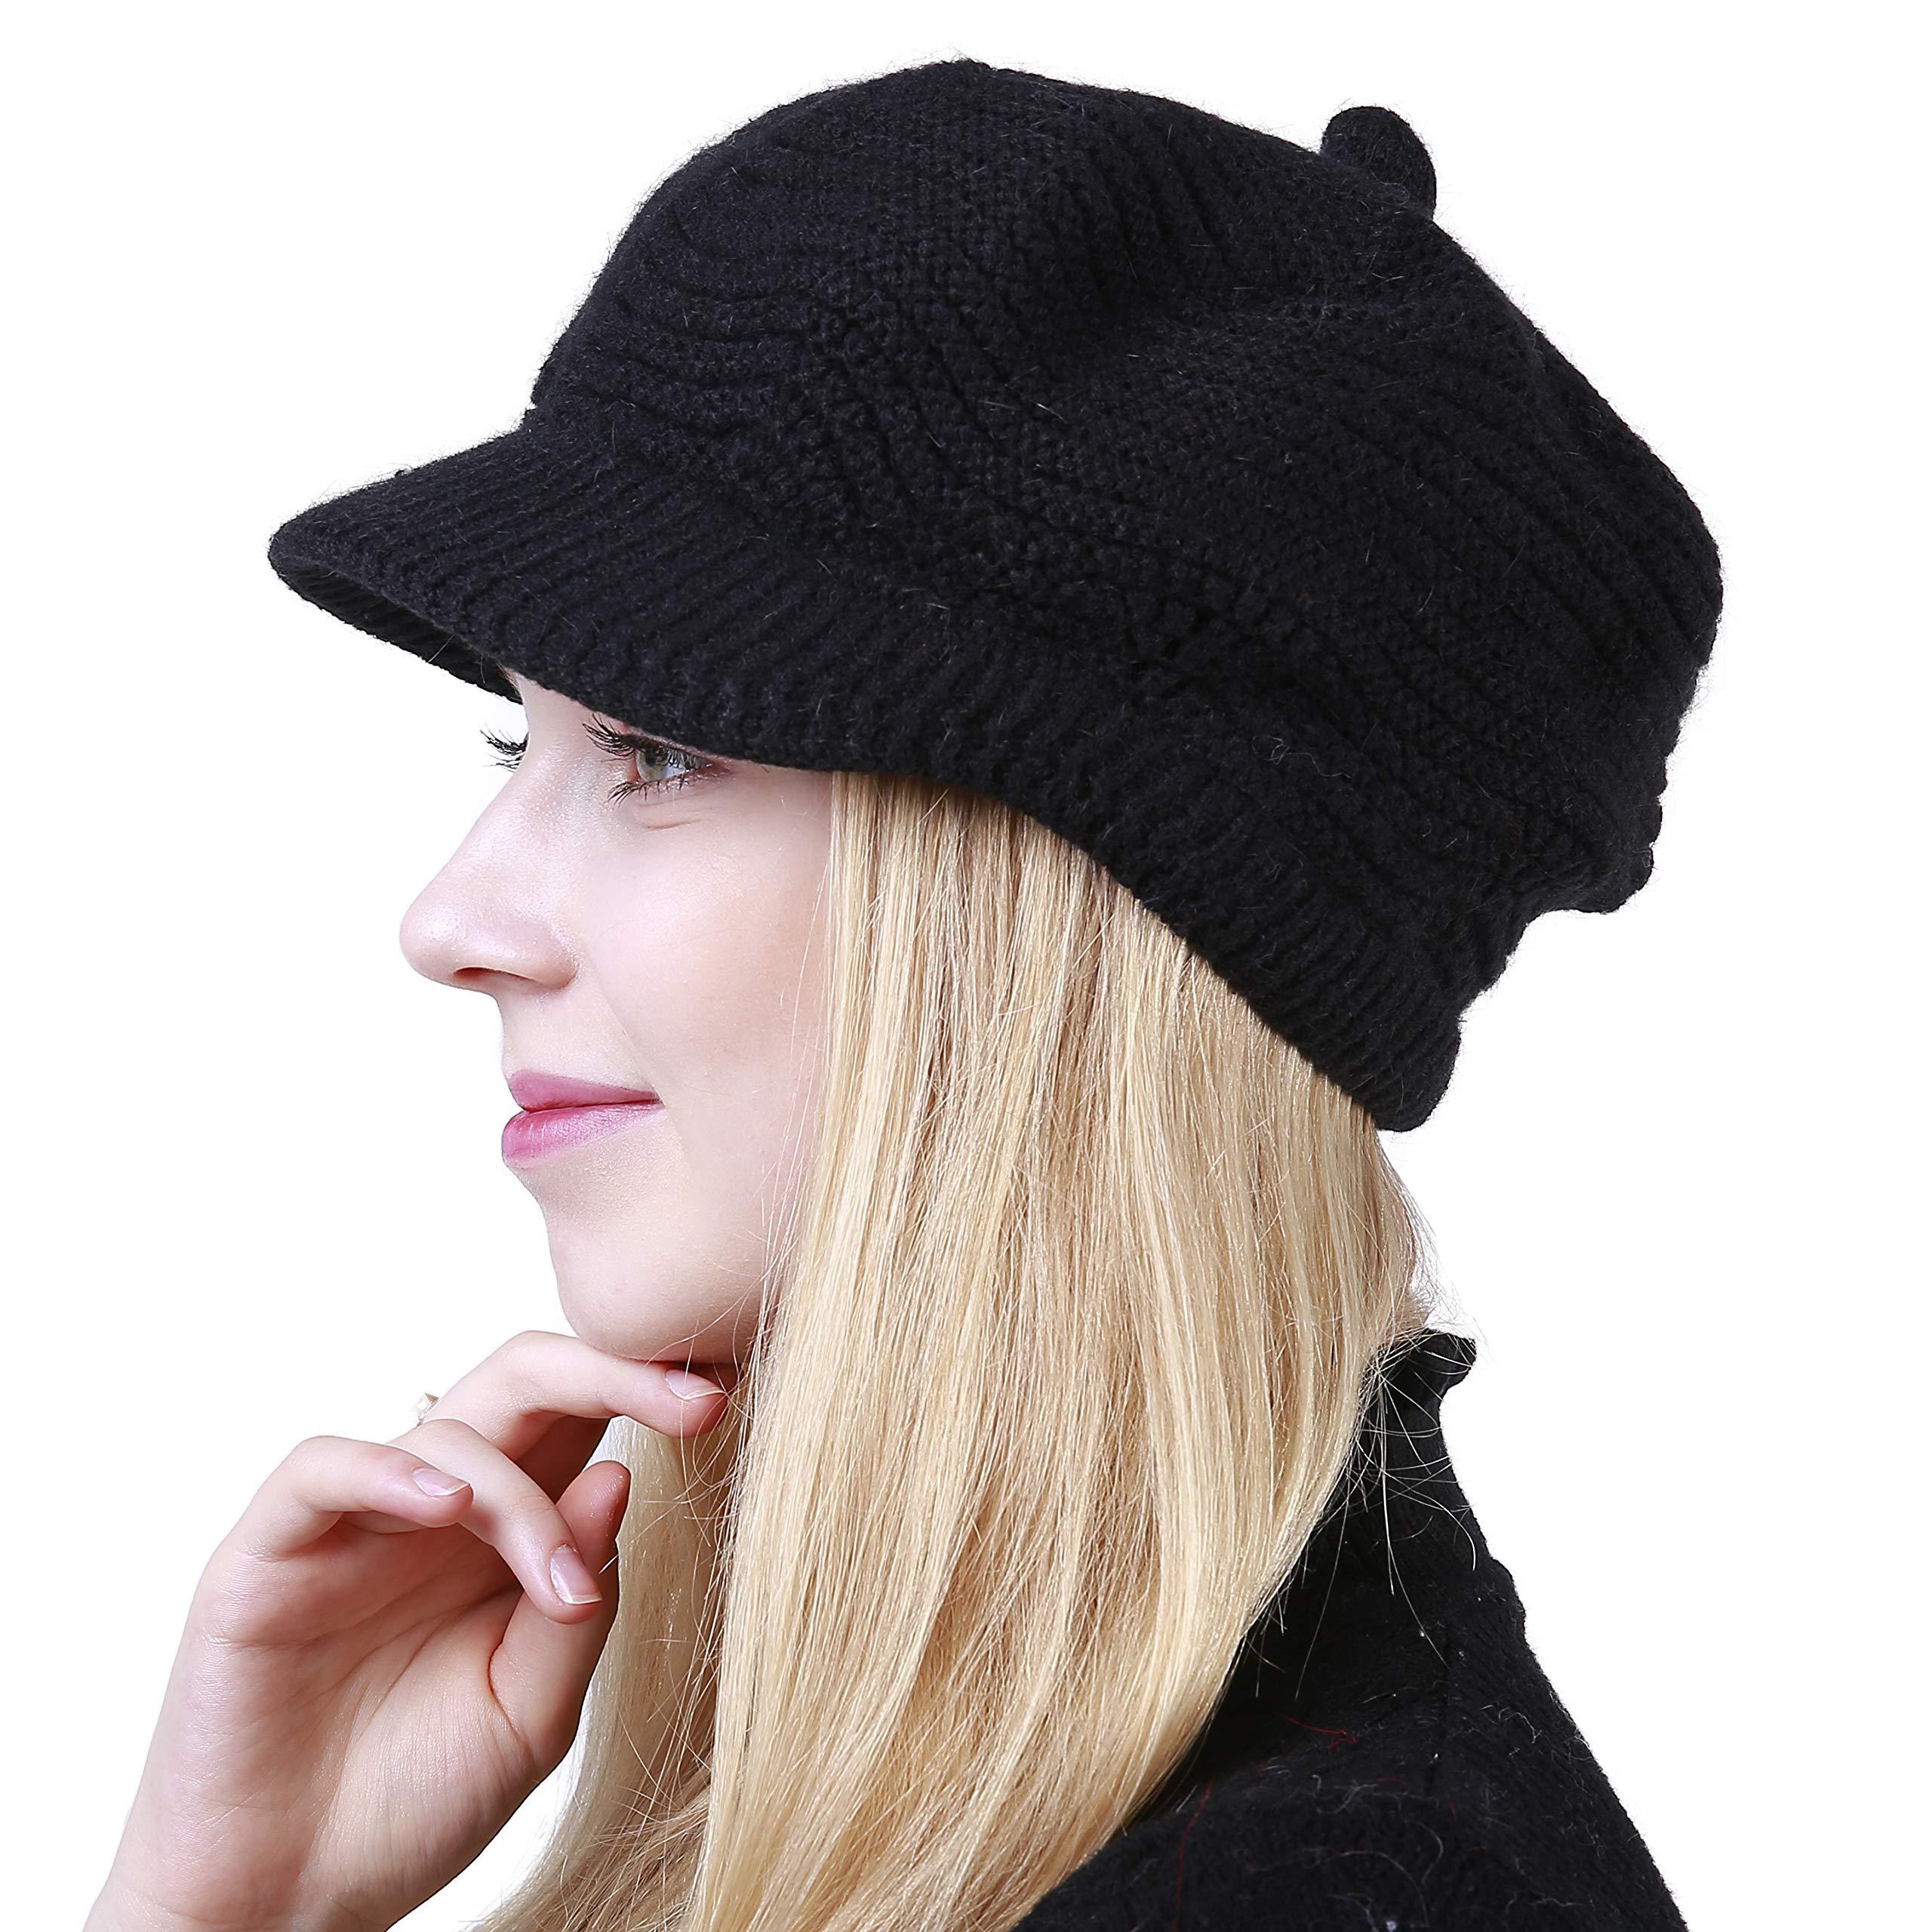 Women's Winter Hat Slouchy Cable Knit Visor Crochet Beanie Hats Warm Snow Ski Skull Cap with Brim Black